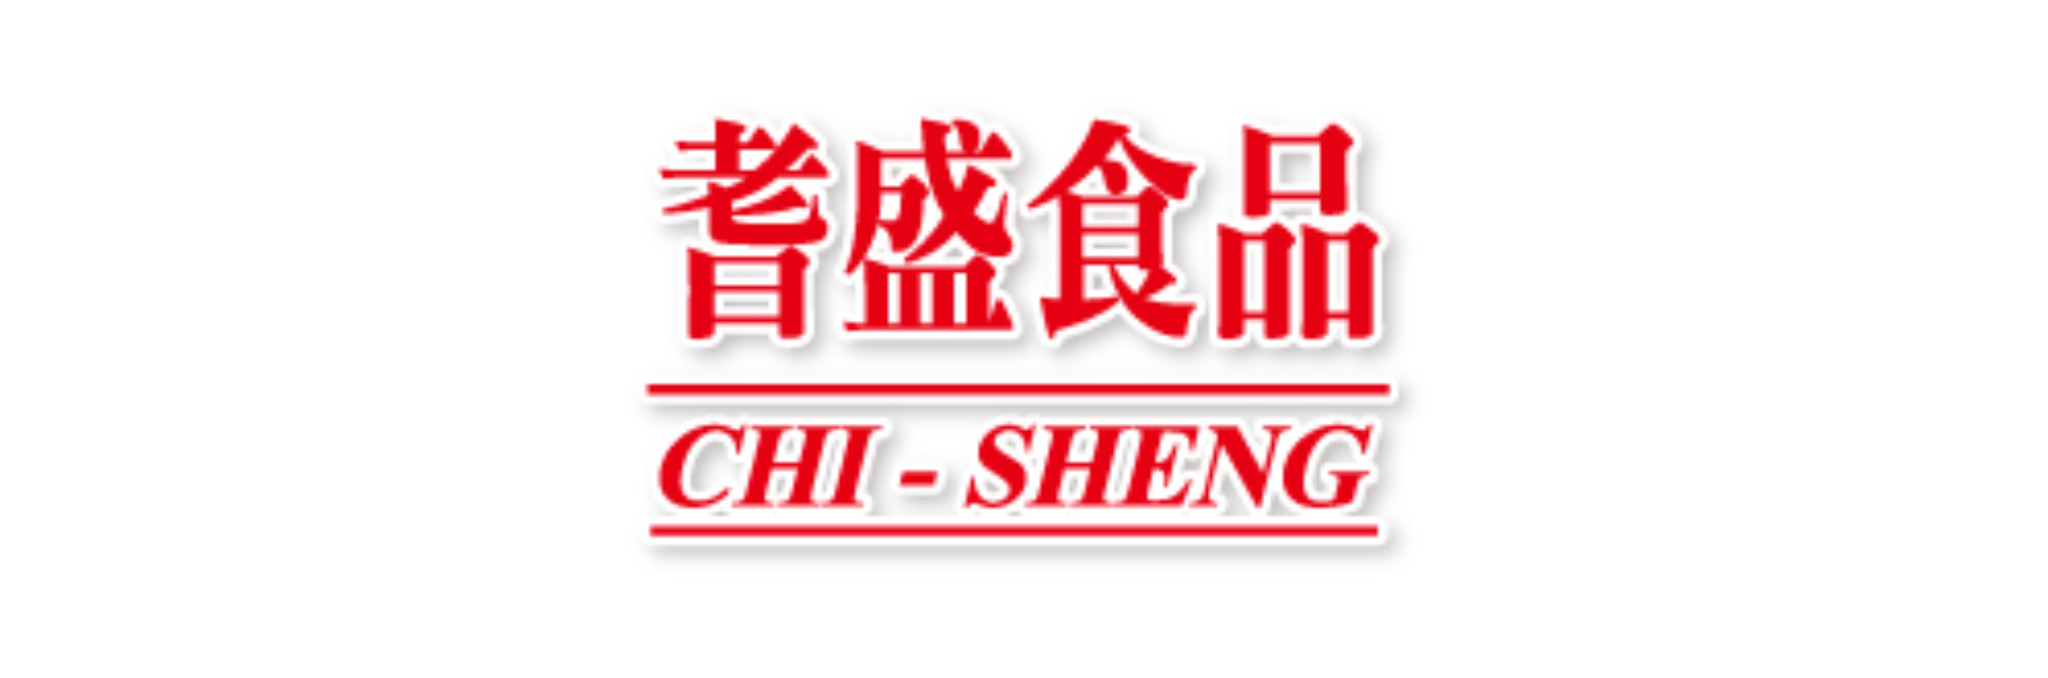 CHI SHENG